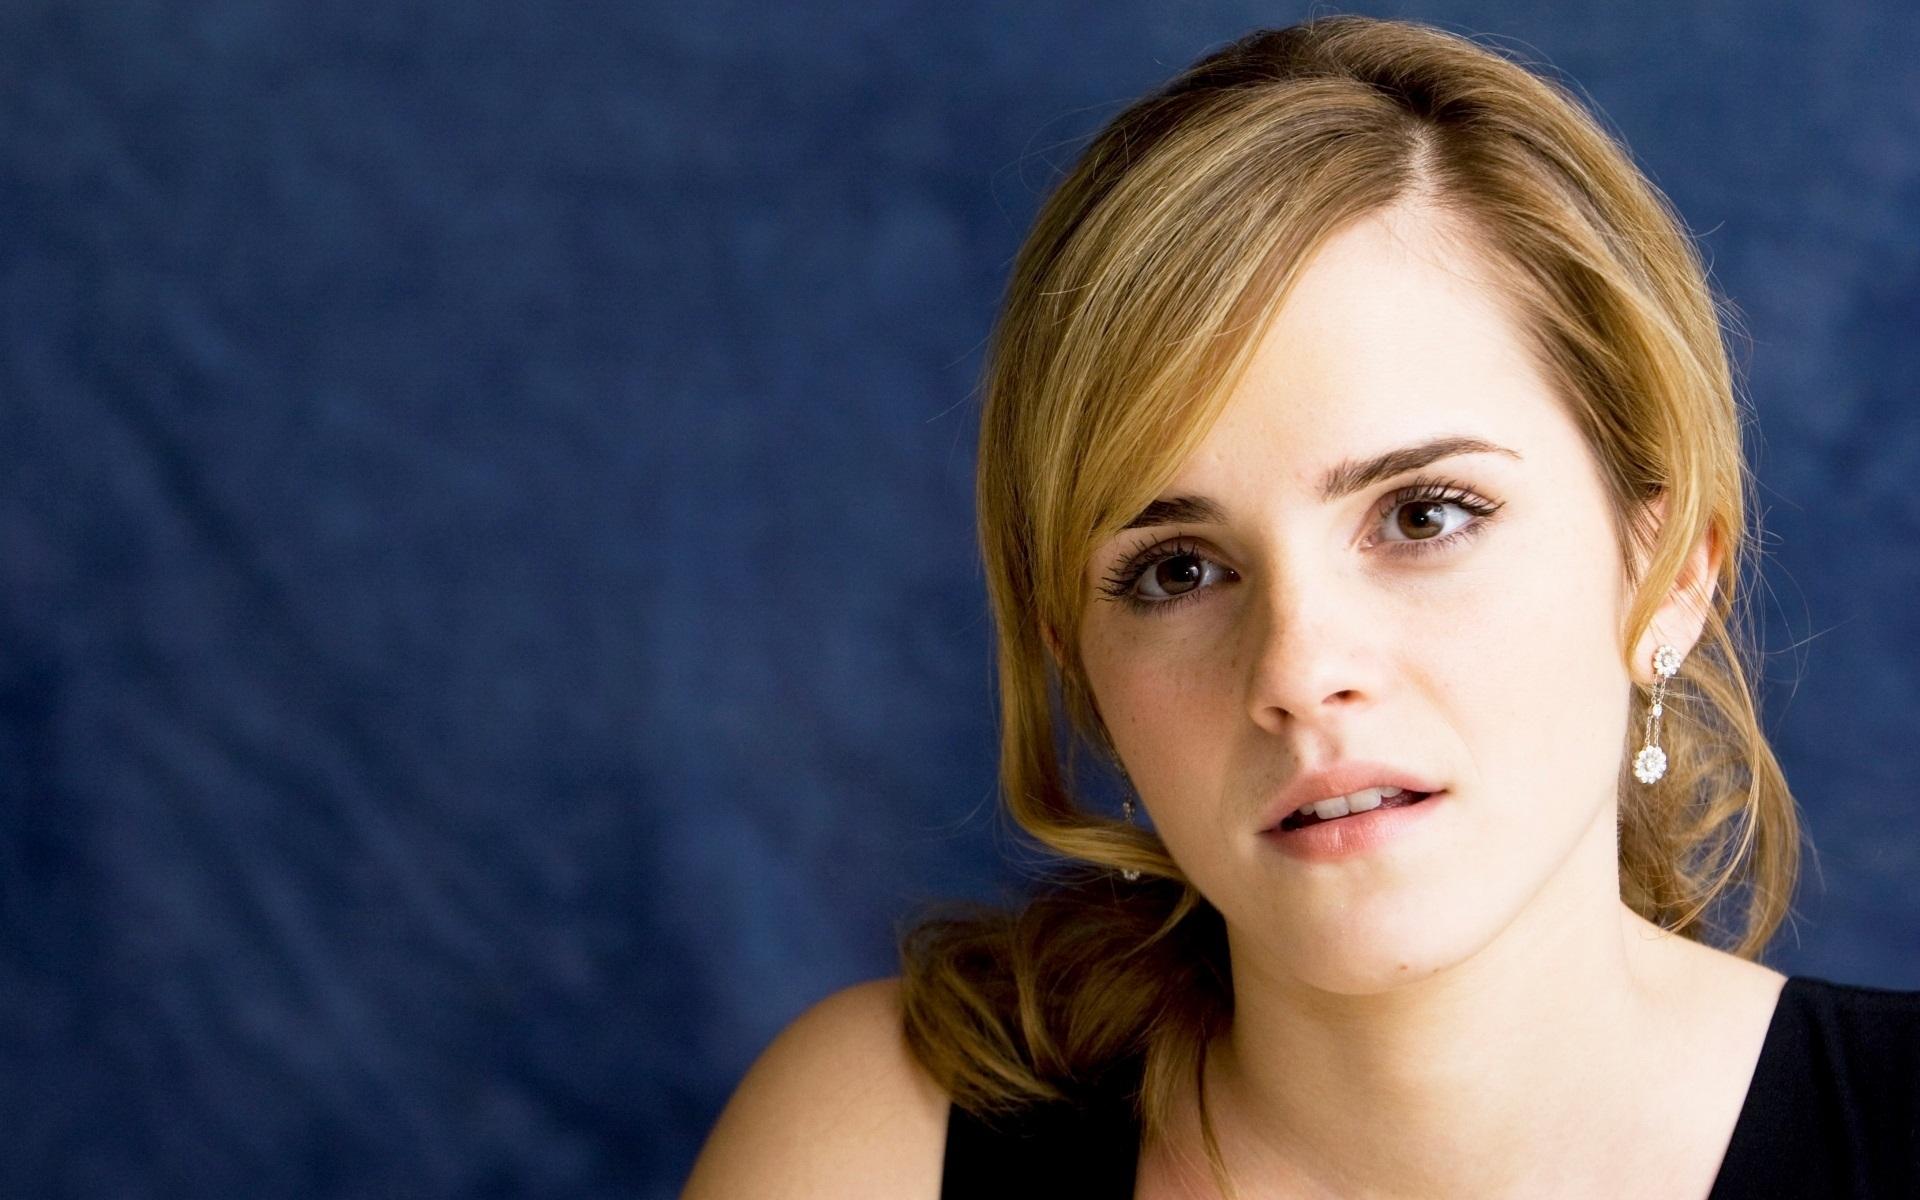 Beautiful Emma Watson HD Wallpaper 4131 1920x1200